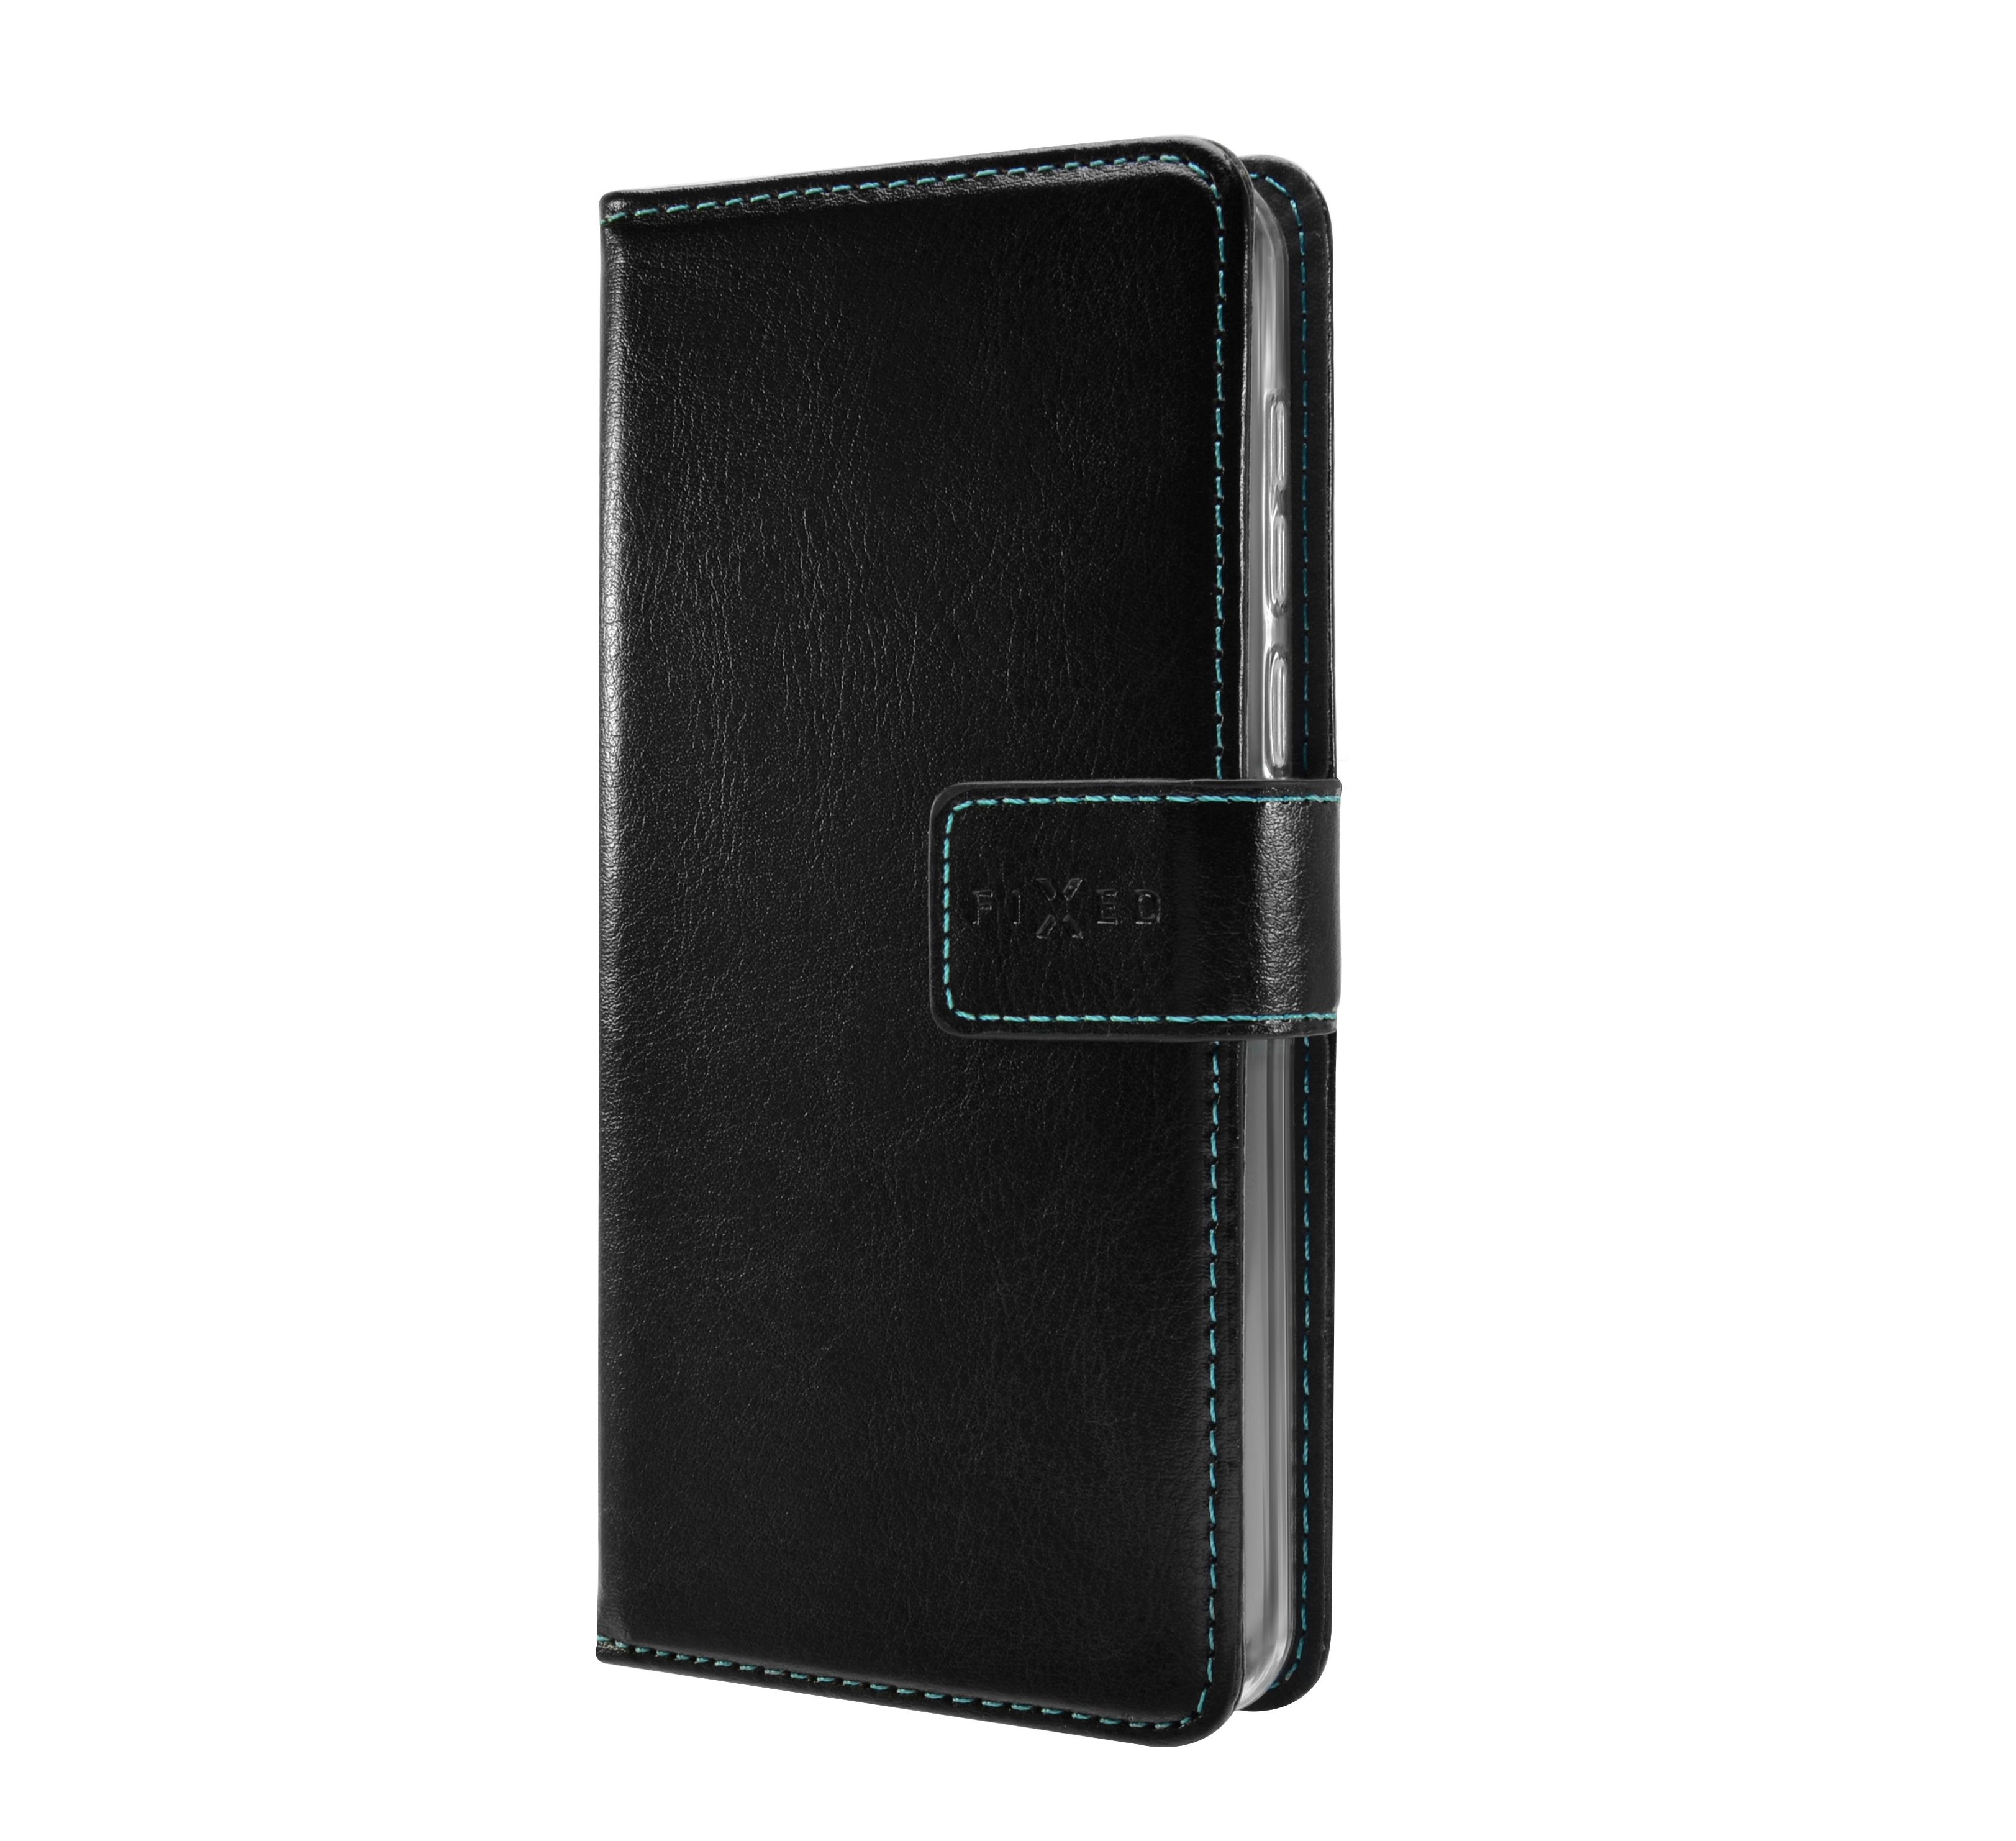 Pouzdro typu kniha FIXED Opus pro Xiaomi Pocophone F1, černé